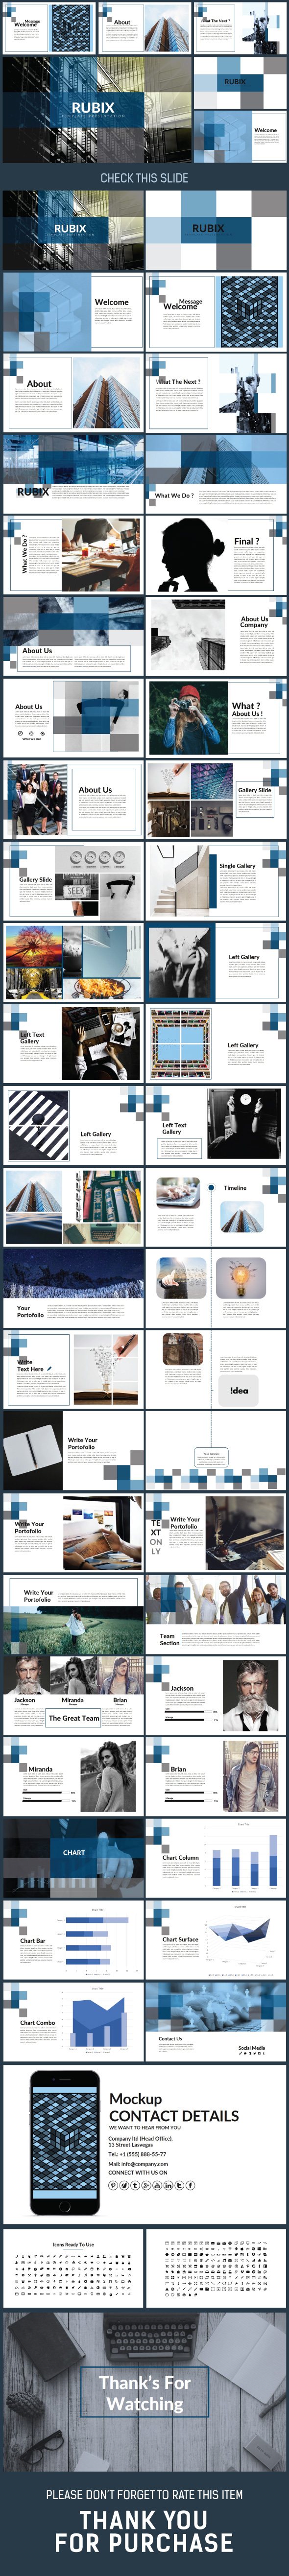 RUBIX Presentation Keynote Template - Creative Keynote Templates